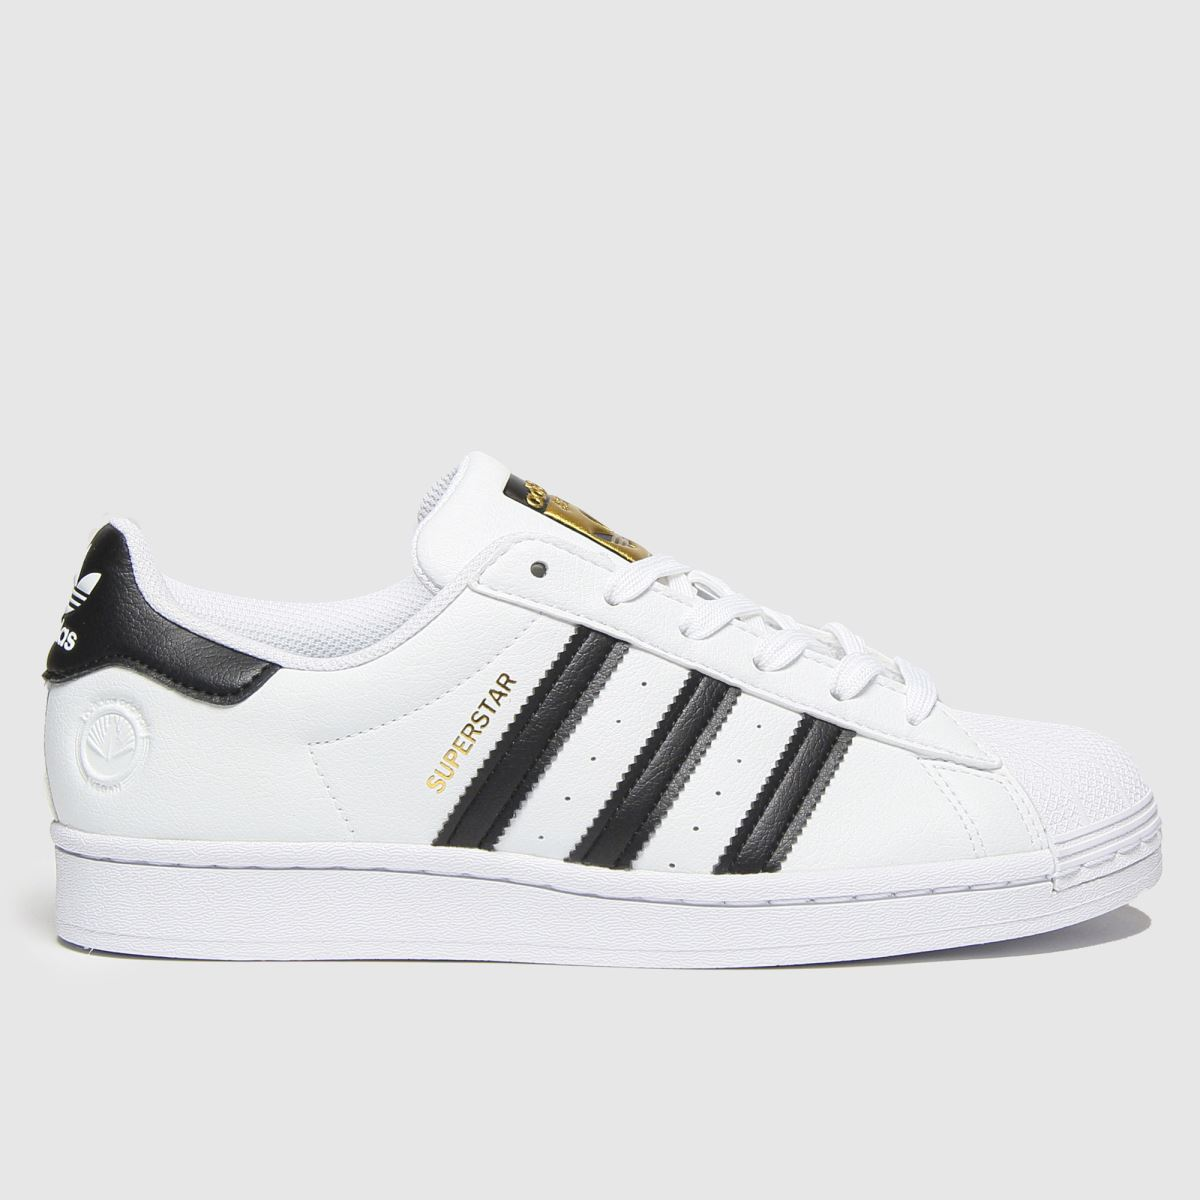 Adidas White & Black Superstar Vegan Trainers